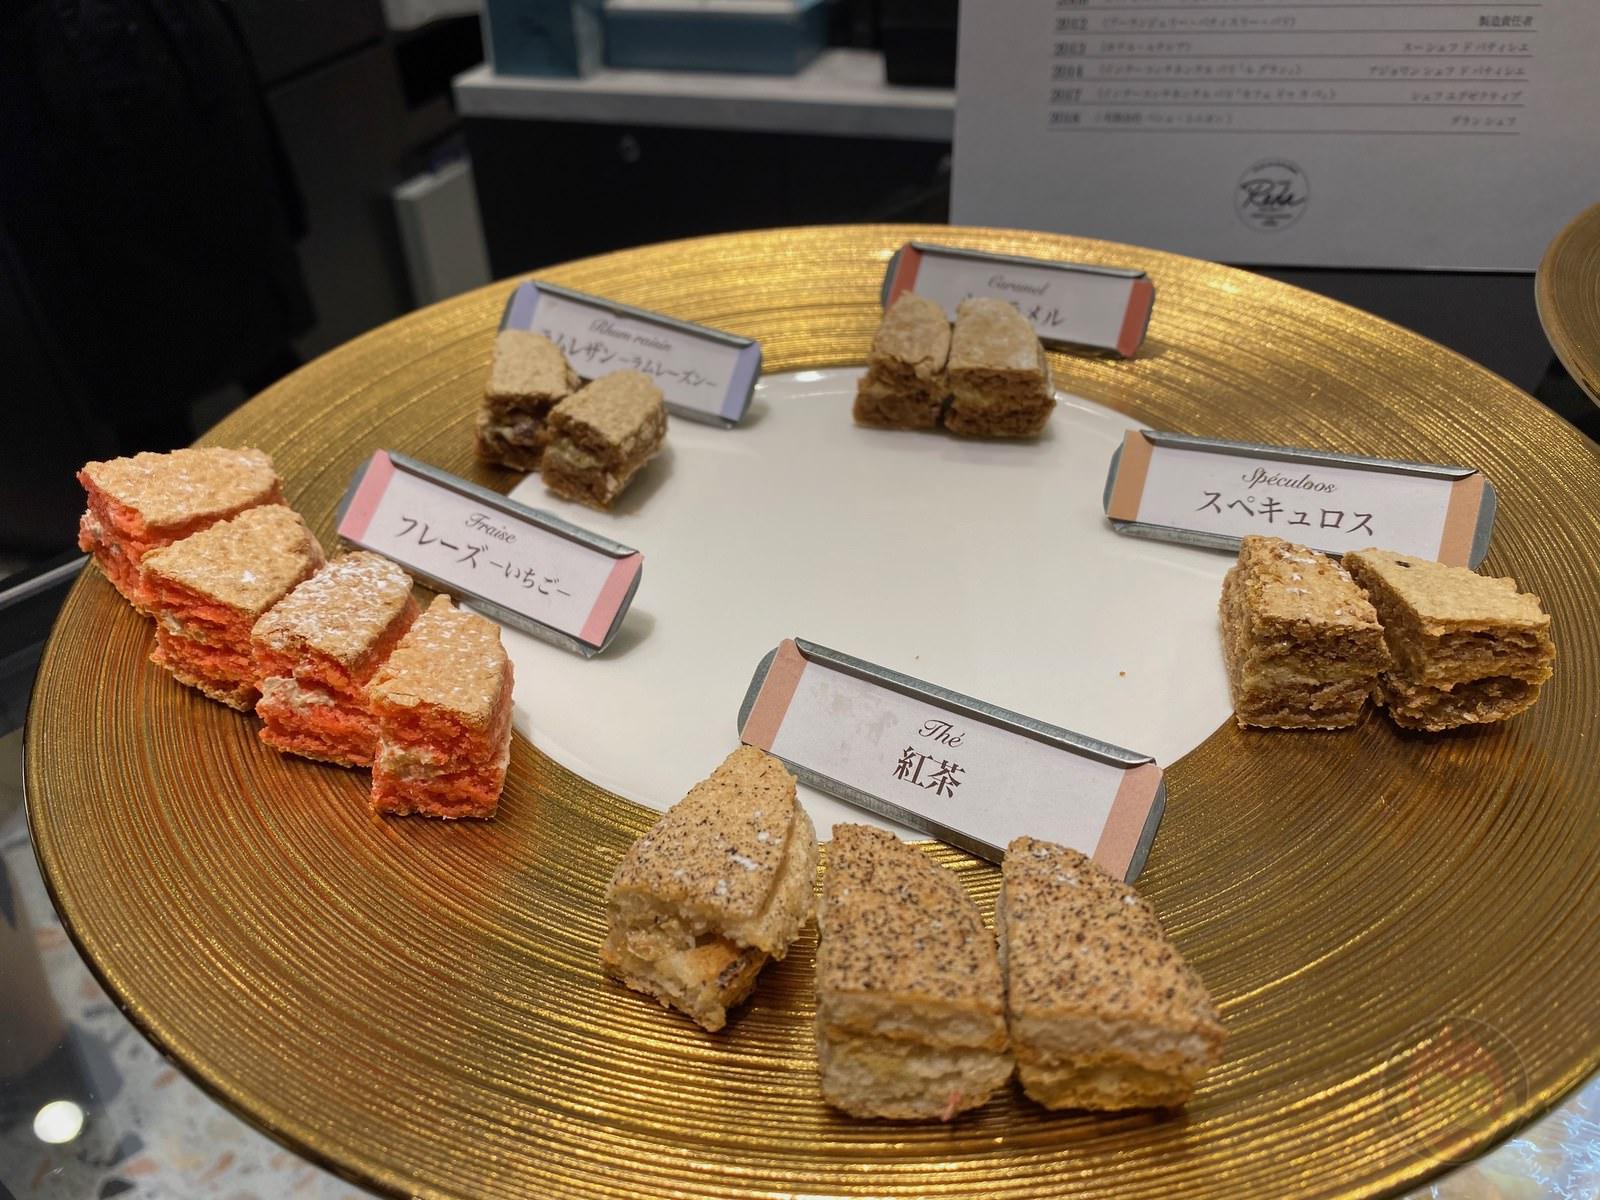 Shibuya-Scramble-Square-Food-I-Ate-94.jpeg